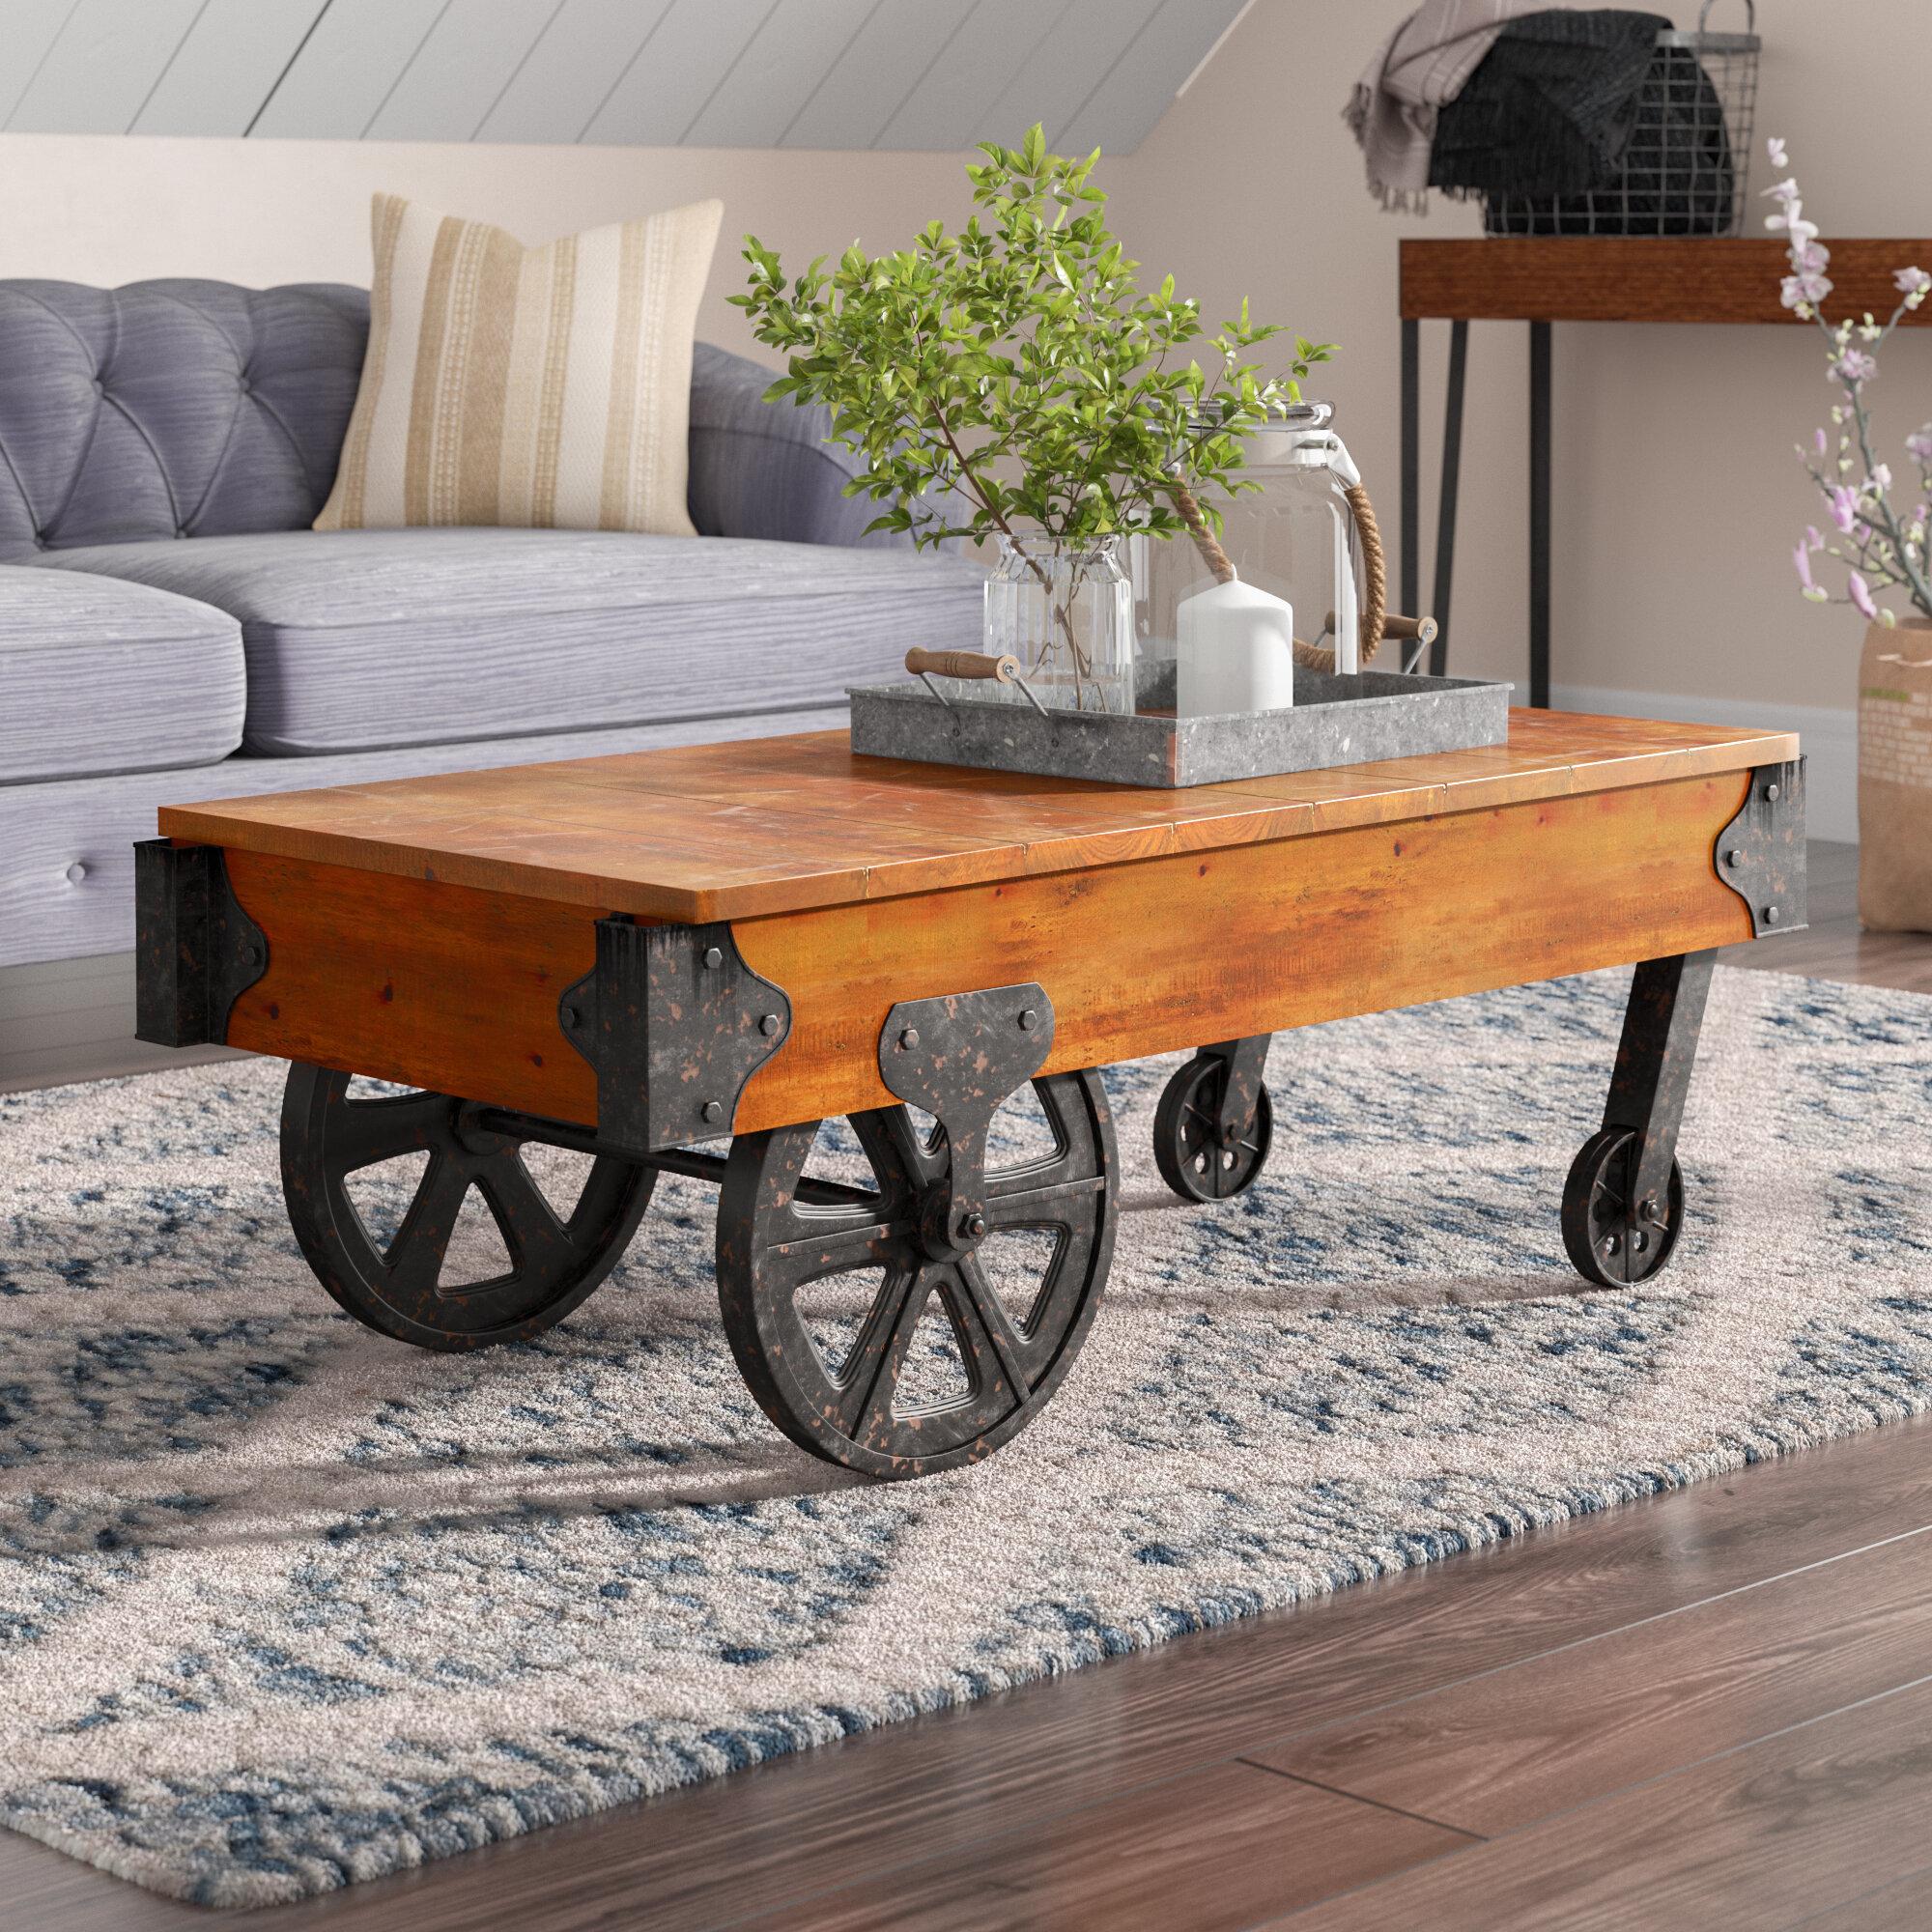 Restoration Hardware Dutch Industrial Coffee Table.Rail Cart Coffee Table Wayfair